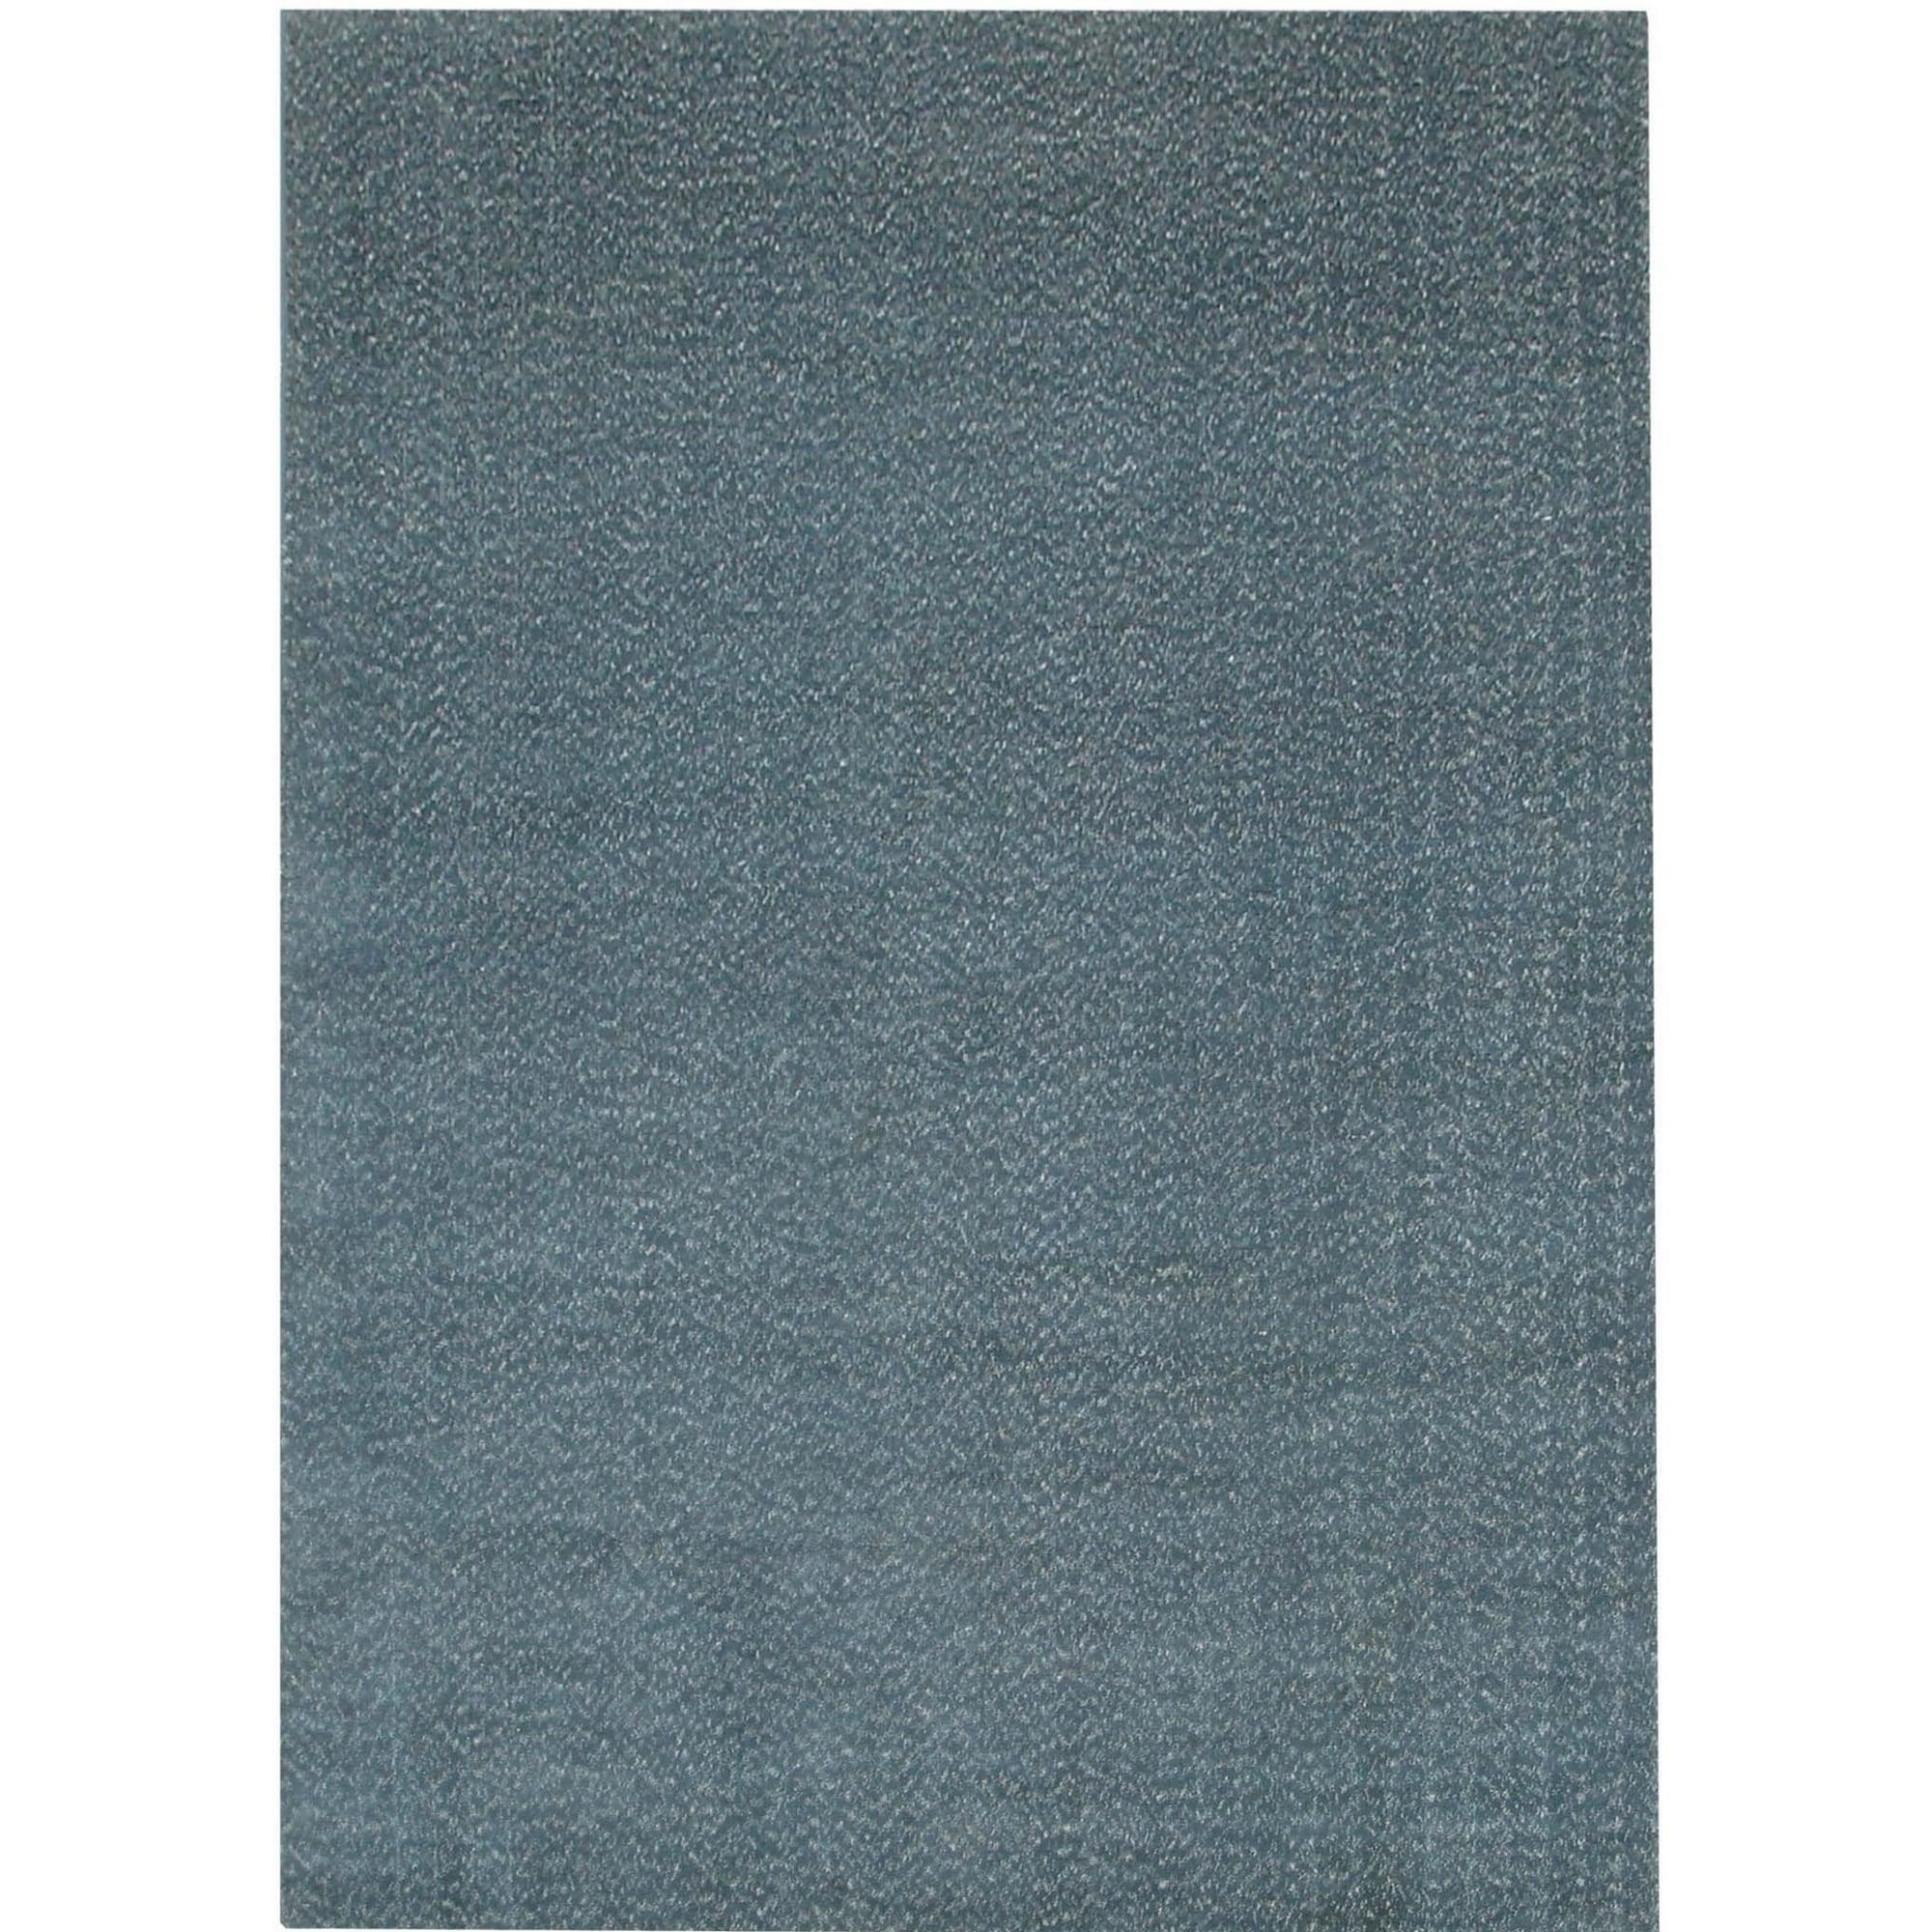 Safavieh Handmade Mirage Modern Blue Viscose Area Rug (6'...